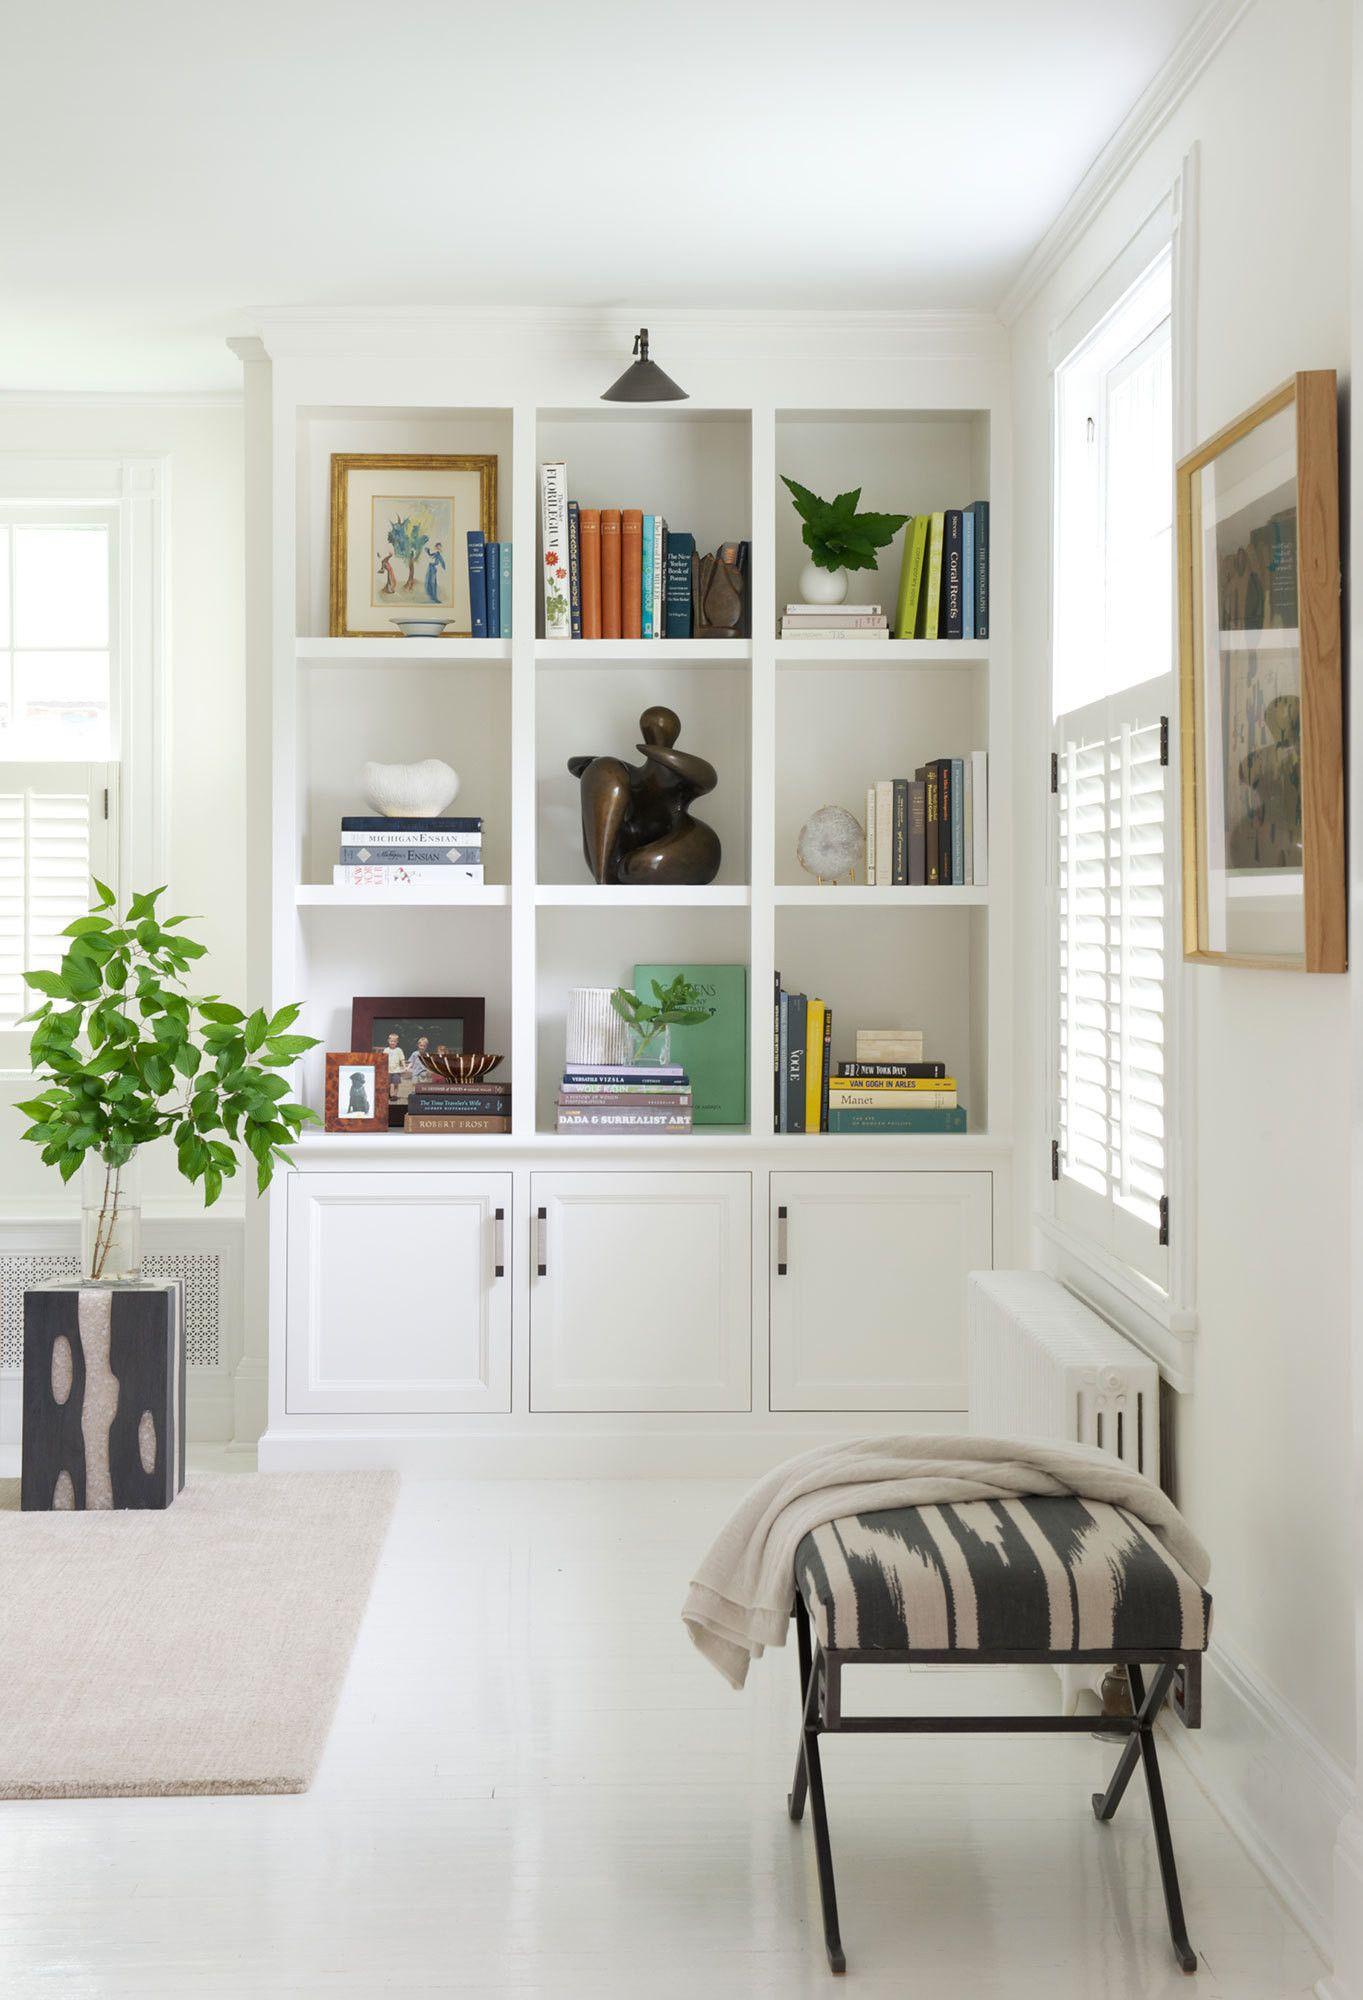 Shelf Life | Shelf life, Modern family and Shelves